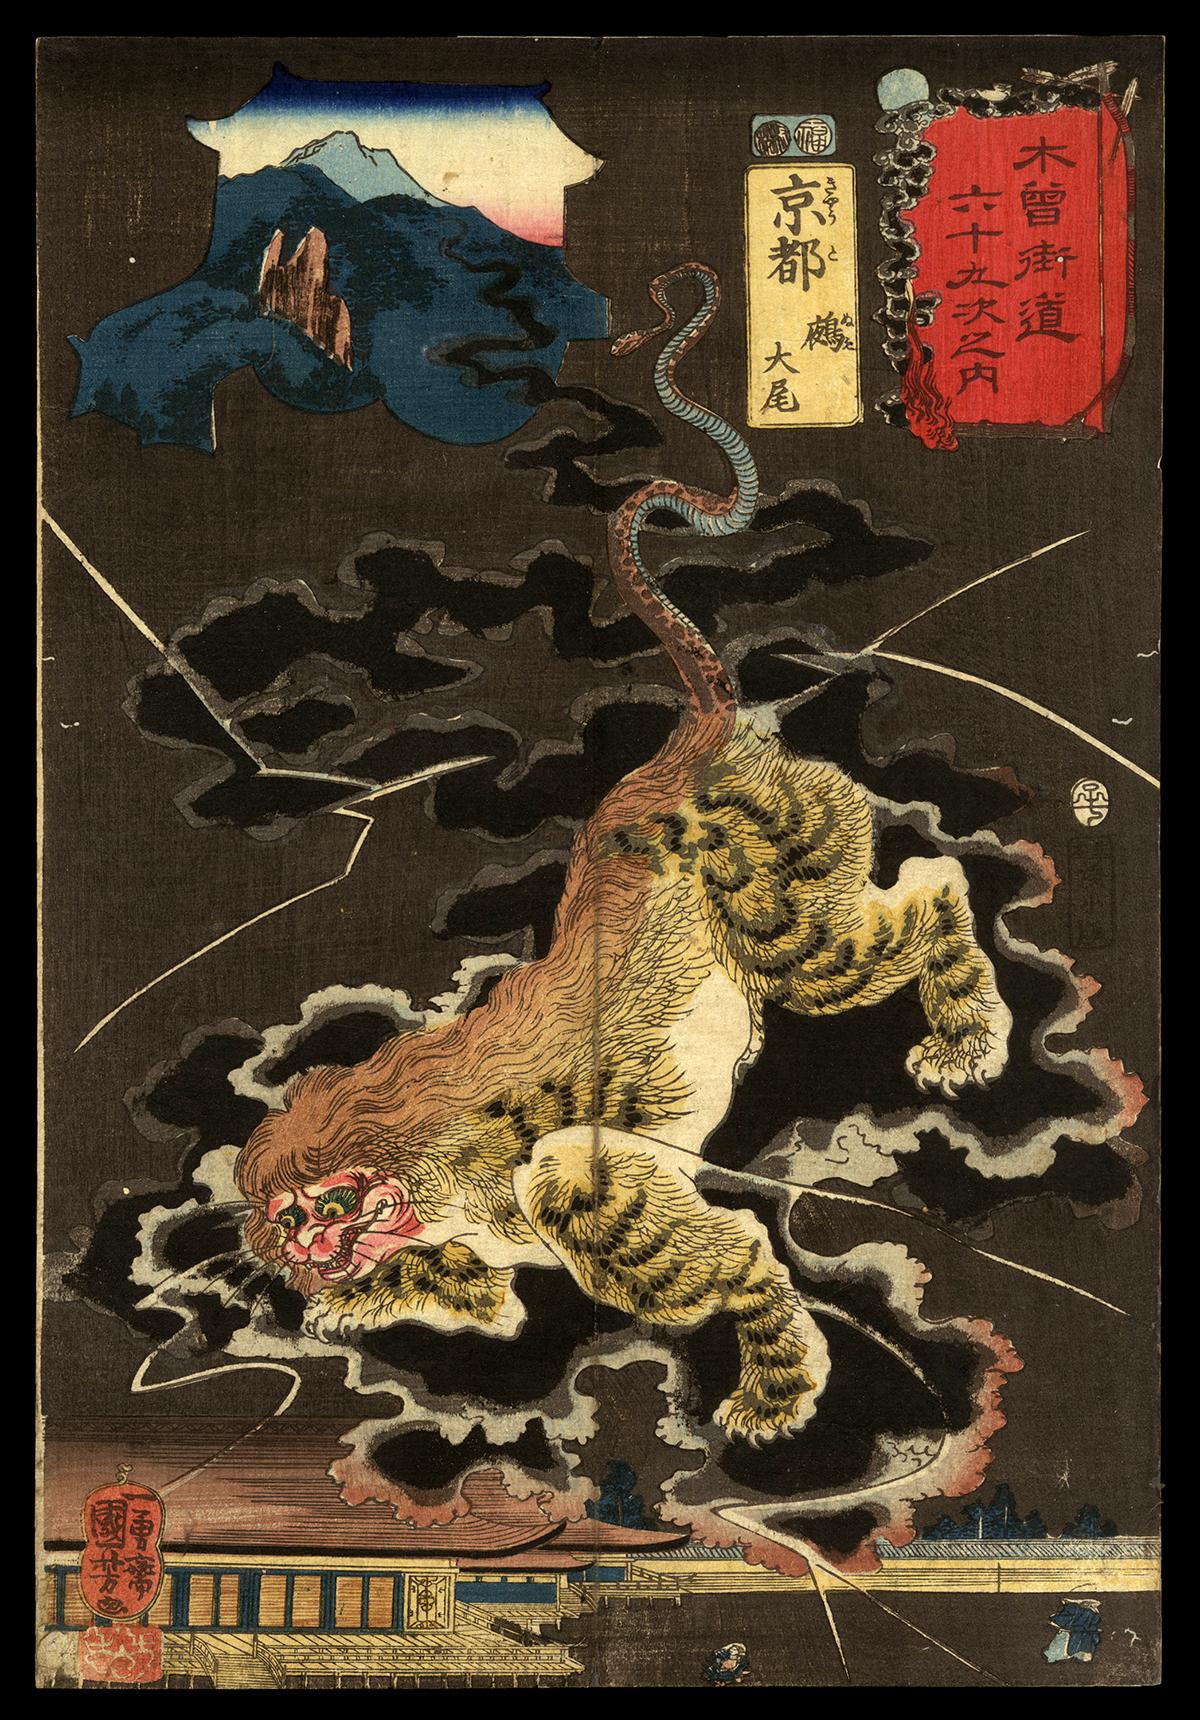 June 12, 2021 Auction of Ukiyo-e and Meiji Prints